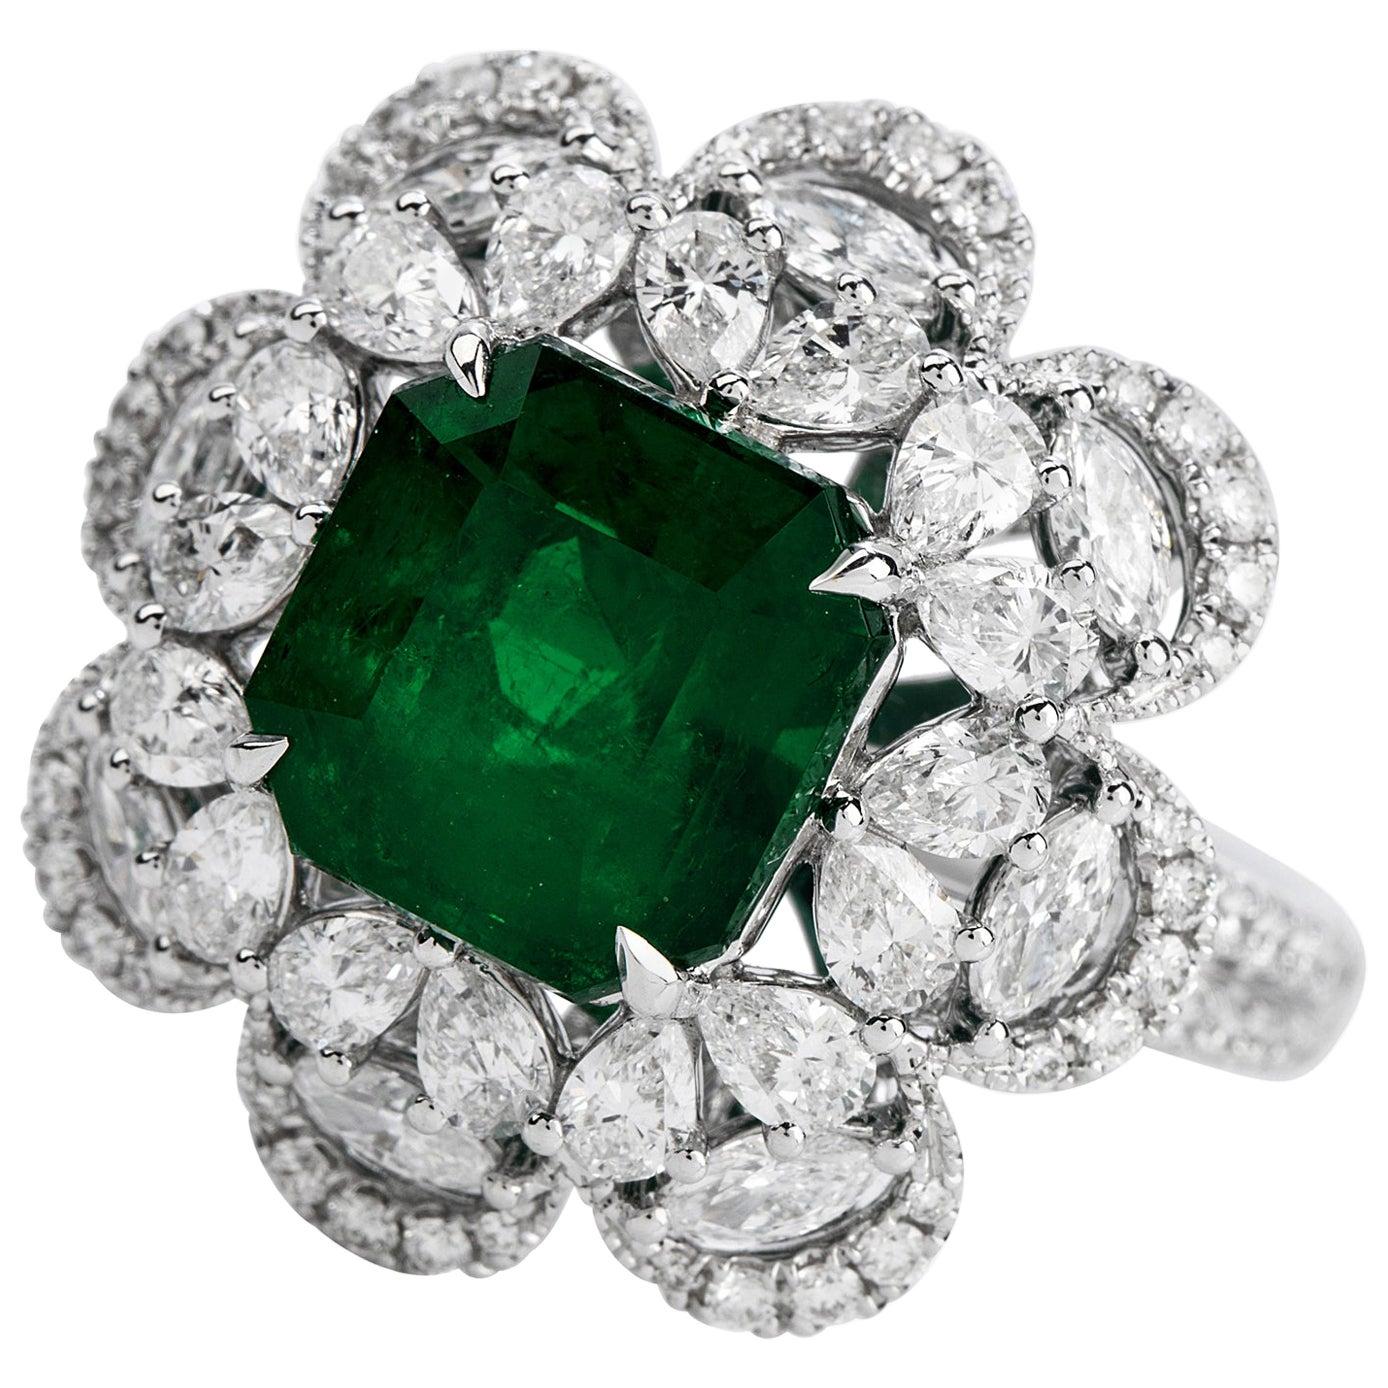 6.96 Carat Colombian Emerald Diamond 18 Karat Gold Large Cocktail Ring